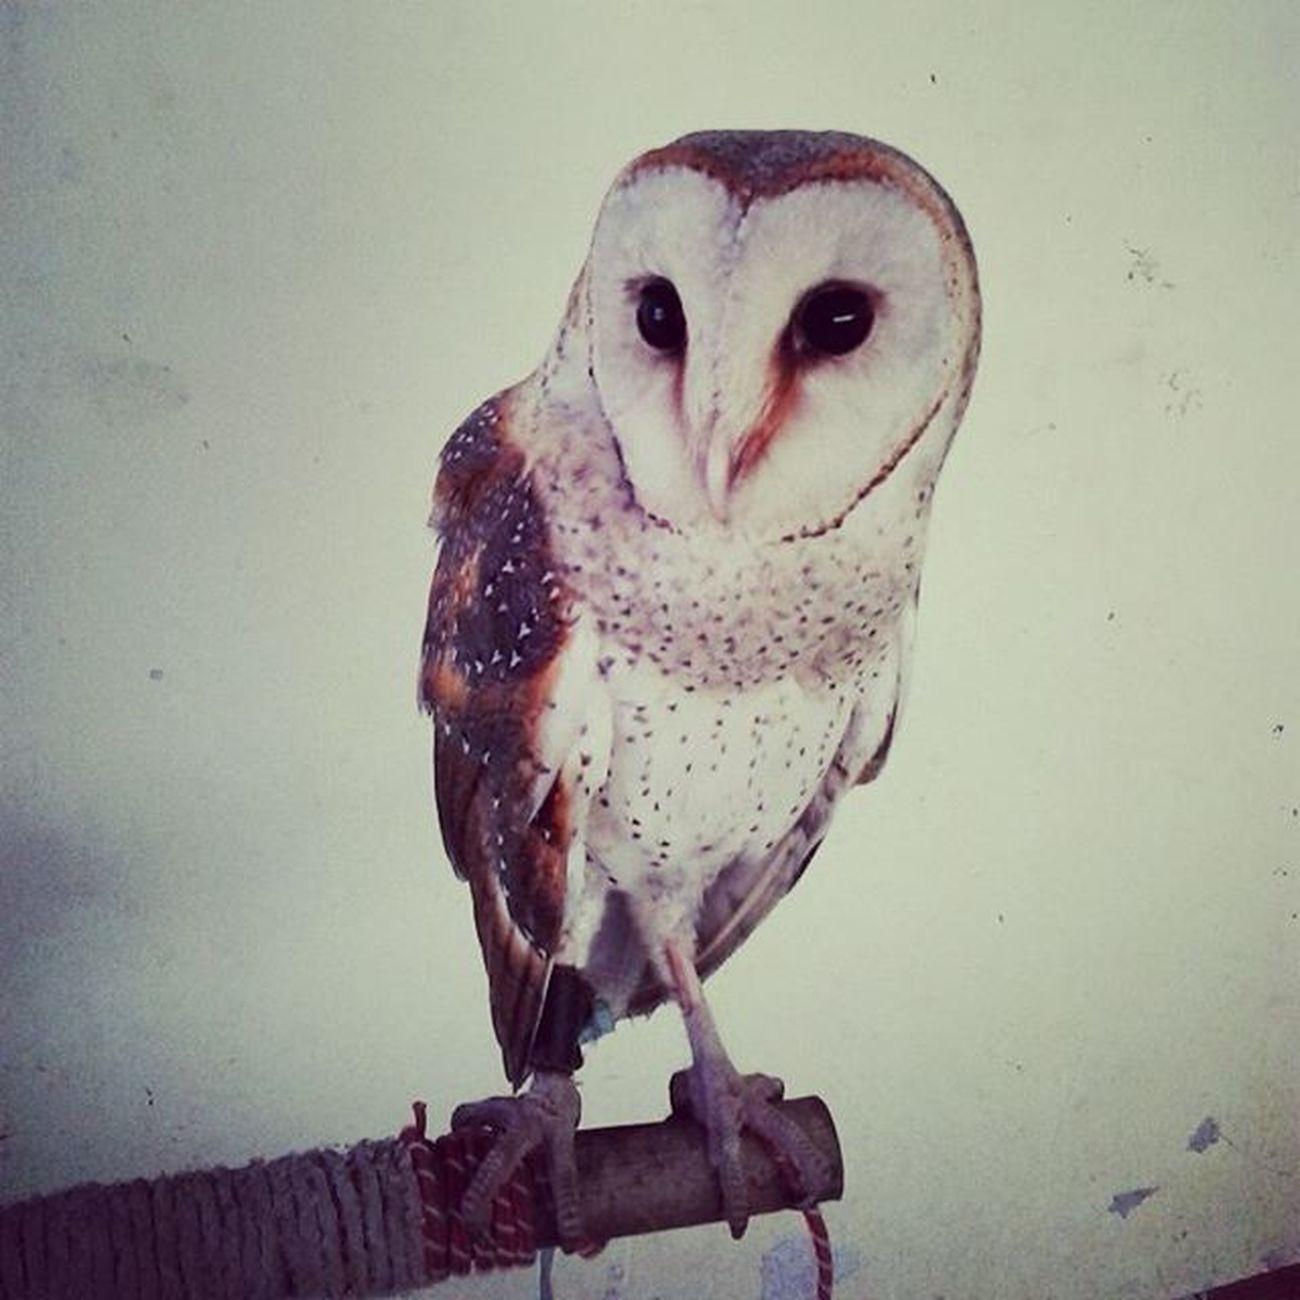 Semoga bahagia sama majikan baru @riskiprayogi Goodbye Delusi Tytoalba Barnowl Serakjawa Birdofprey Birdsofprey Owlsofinstagram Instadaily Like4like Taptap